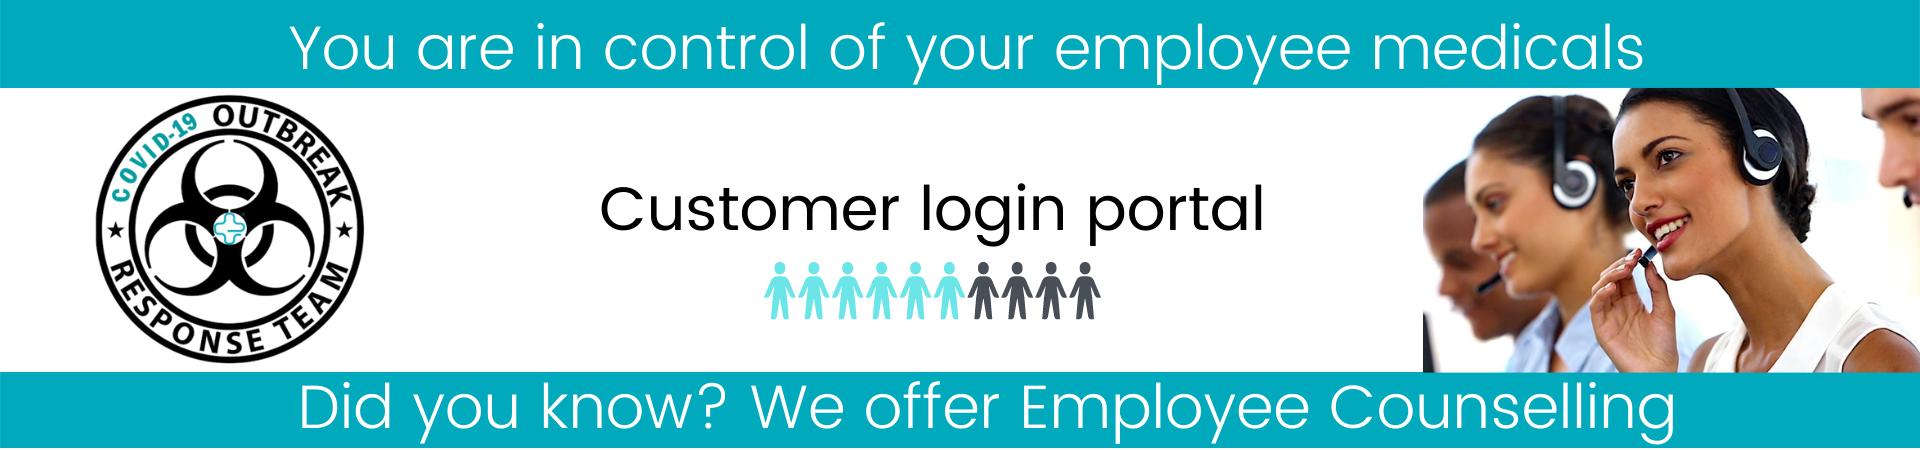 Customer login portal